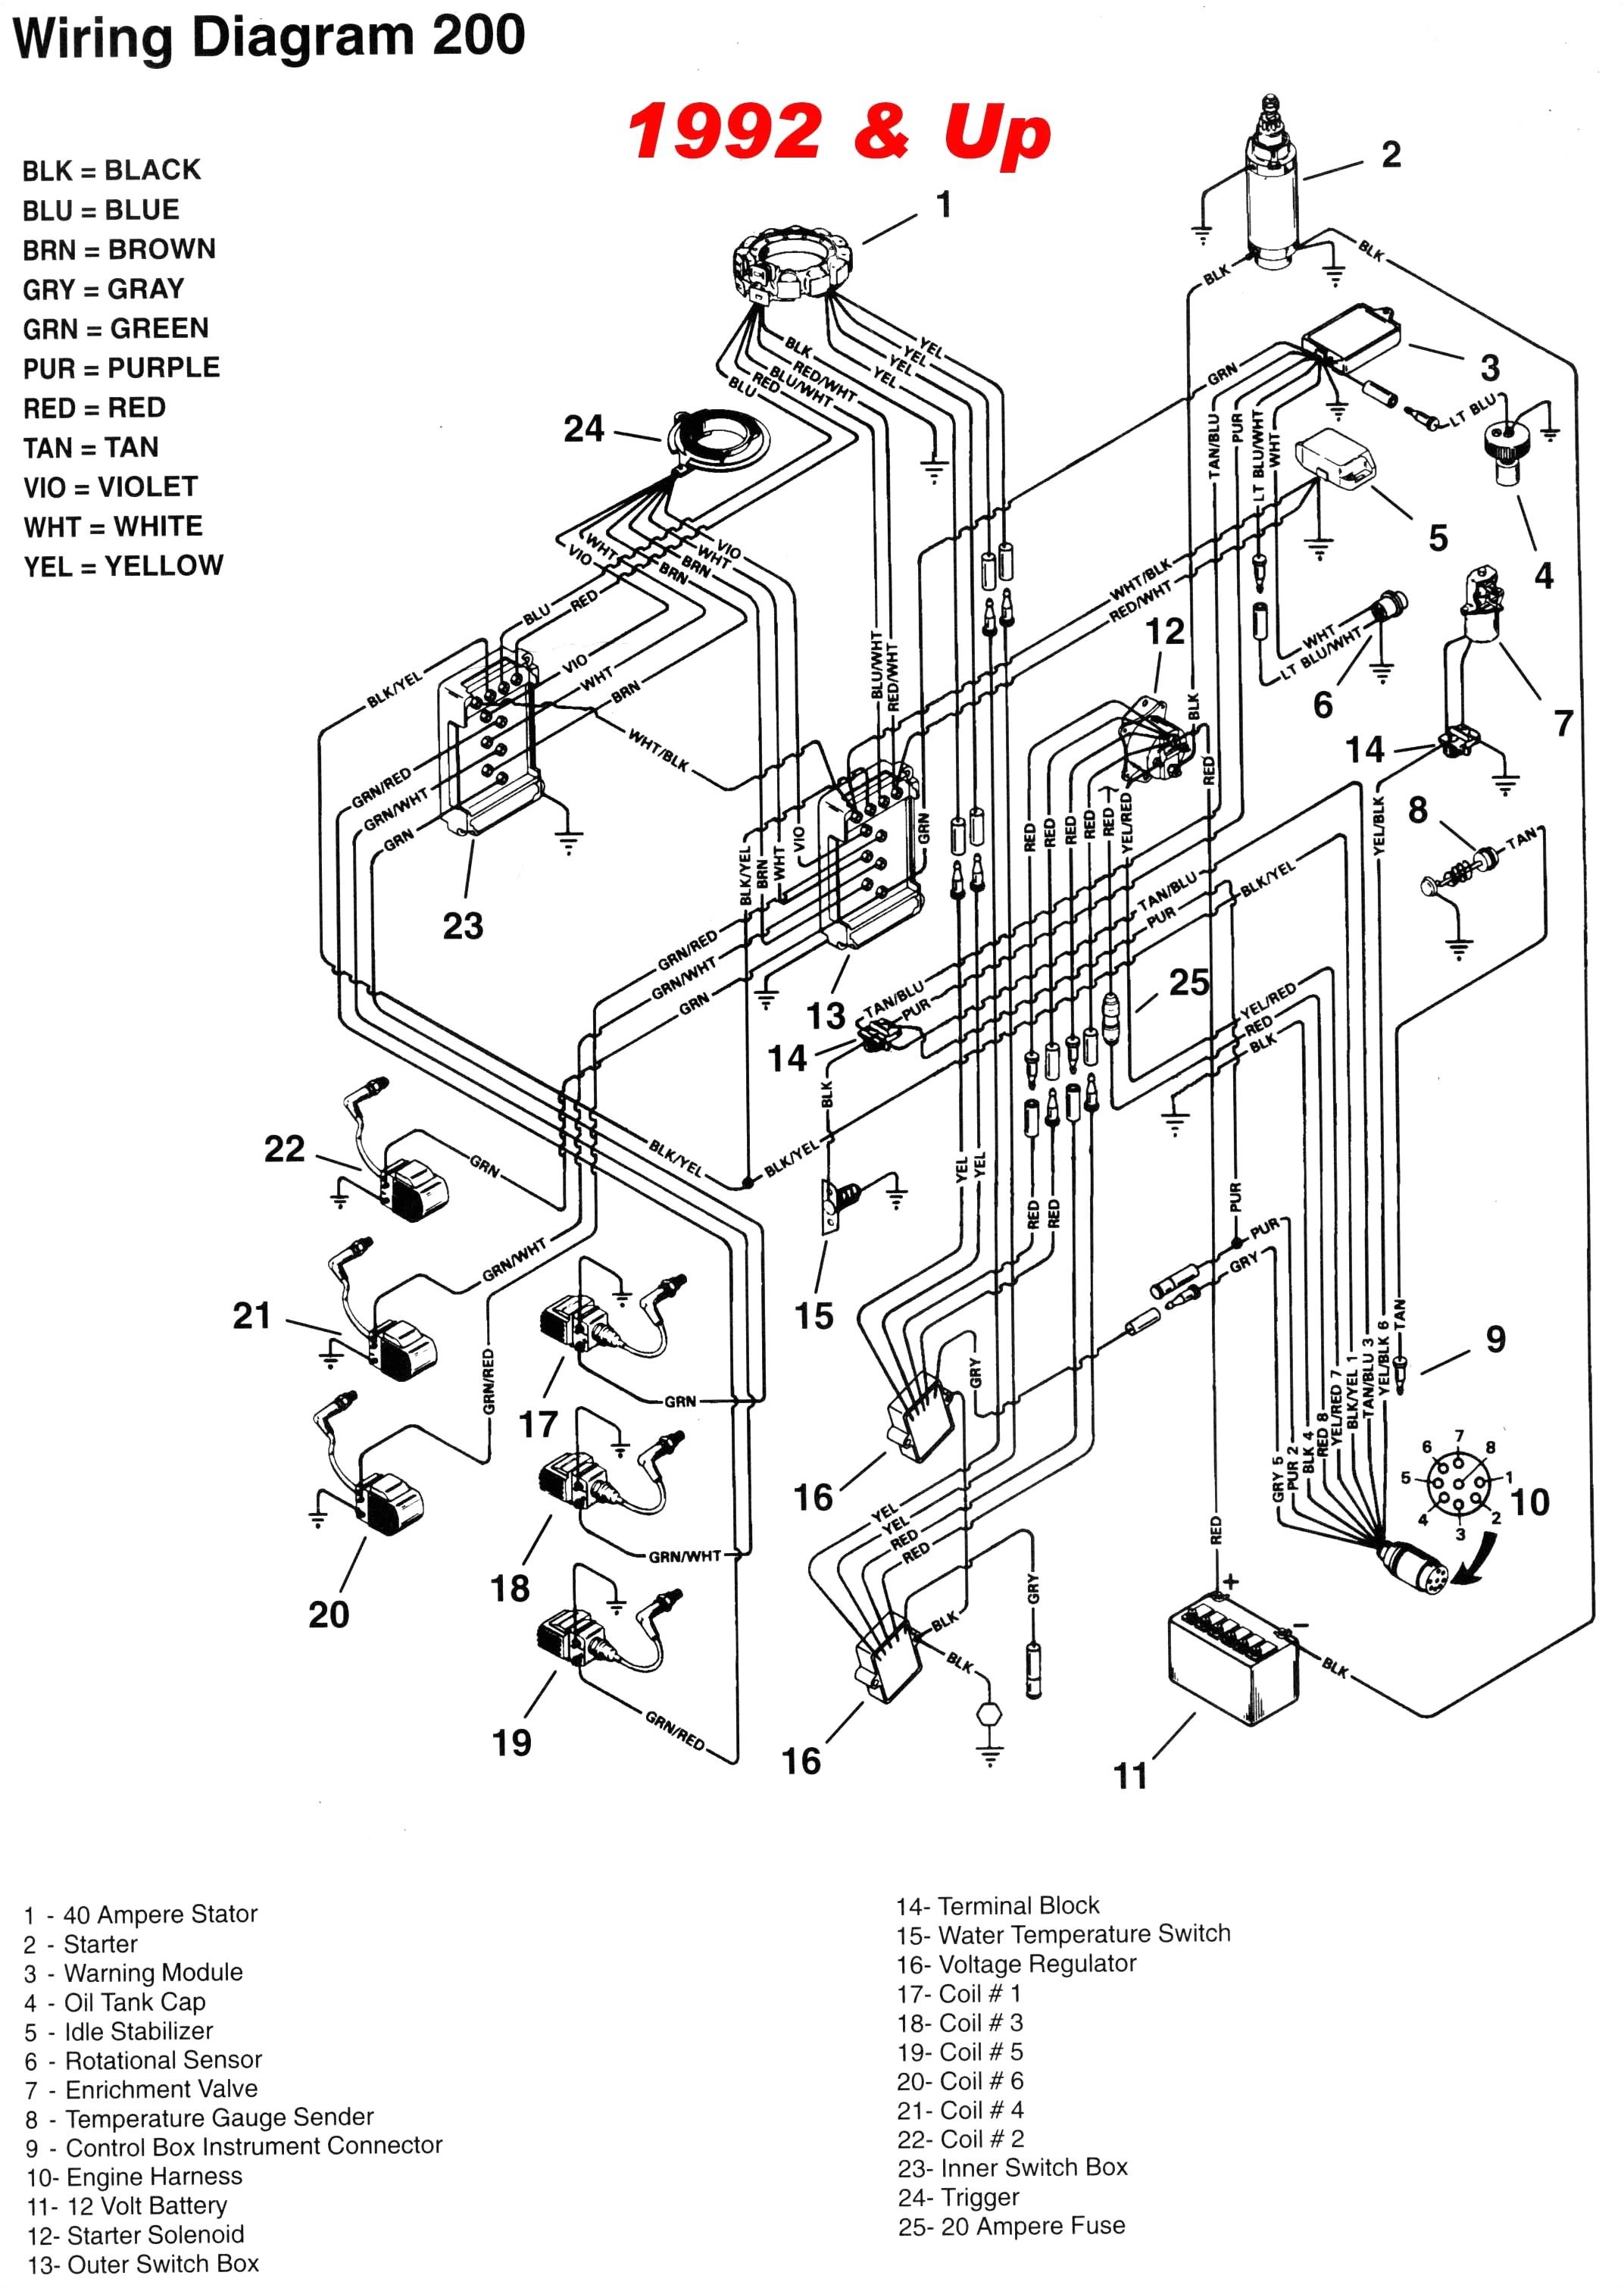 50 mercury wiring harness diagram wiring diagrams favorites 50 mercury wiring harness diagram